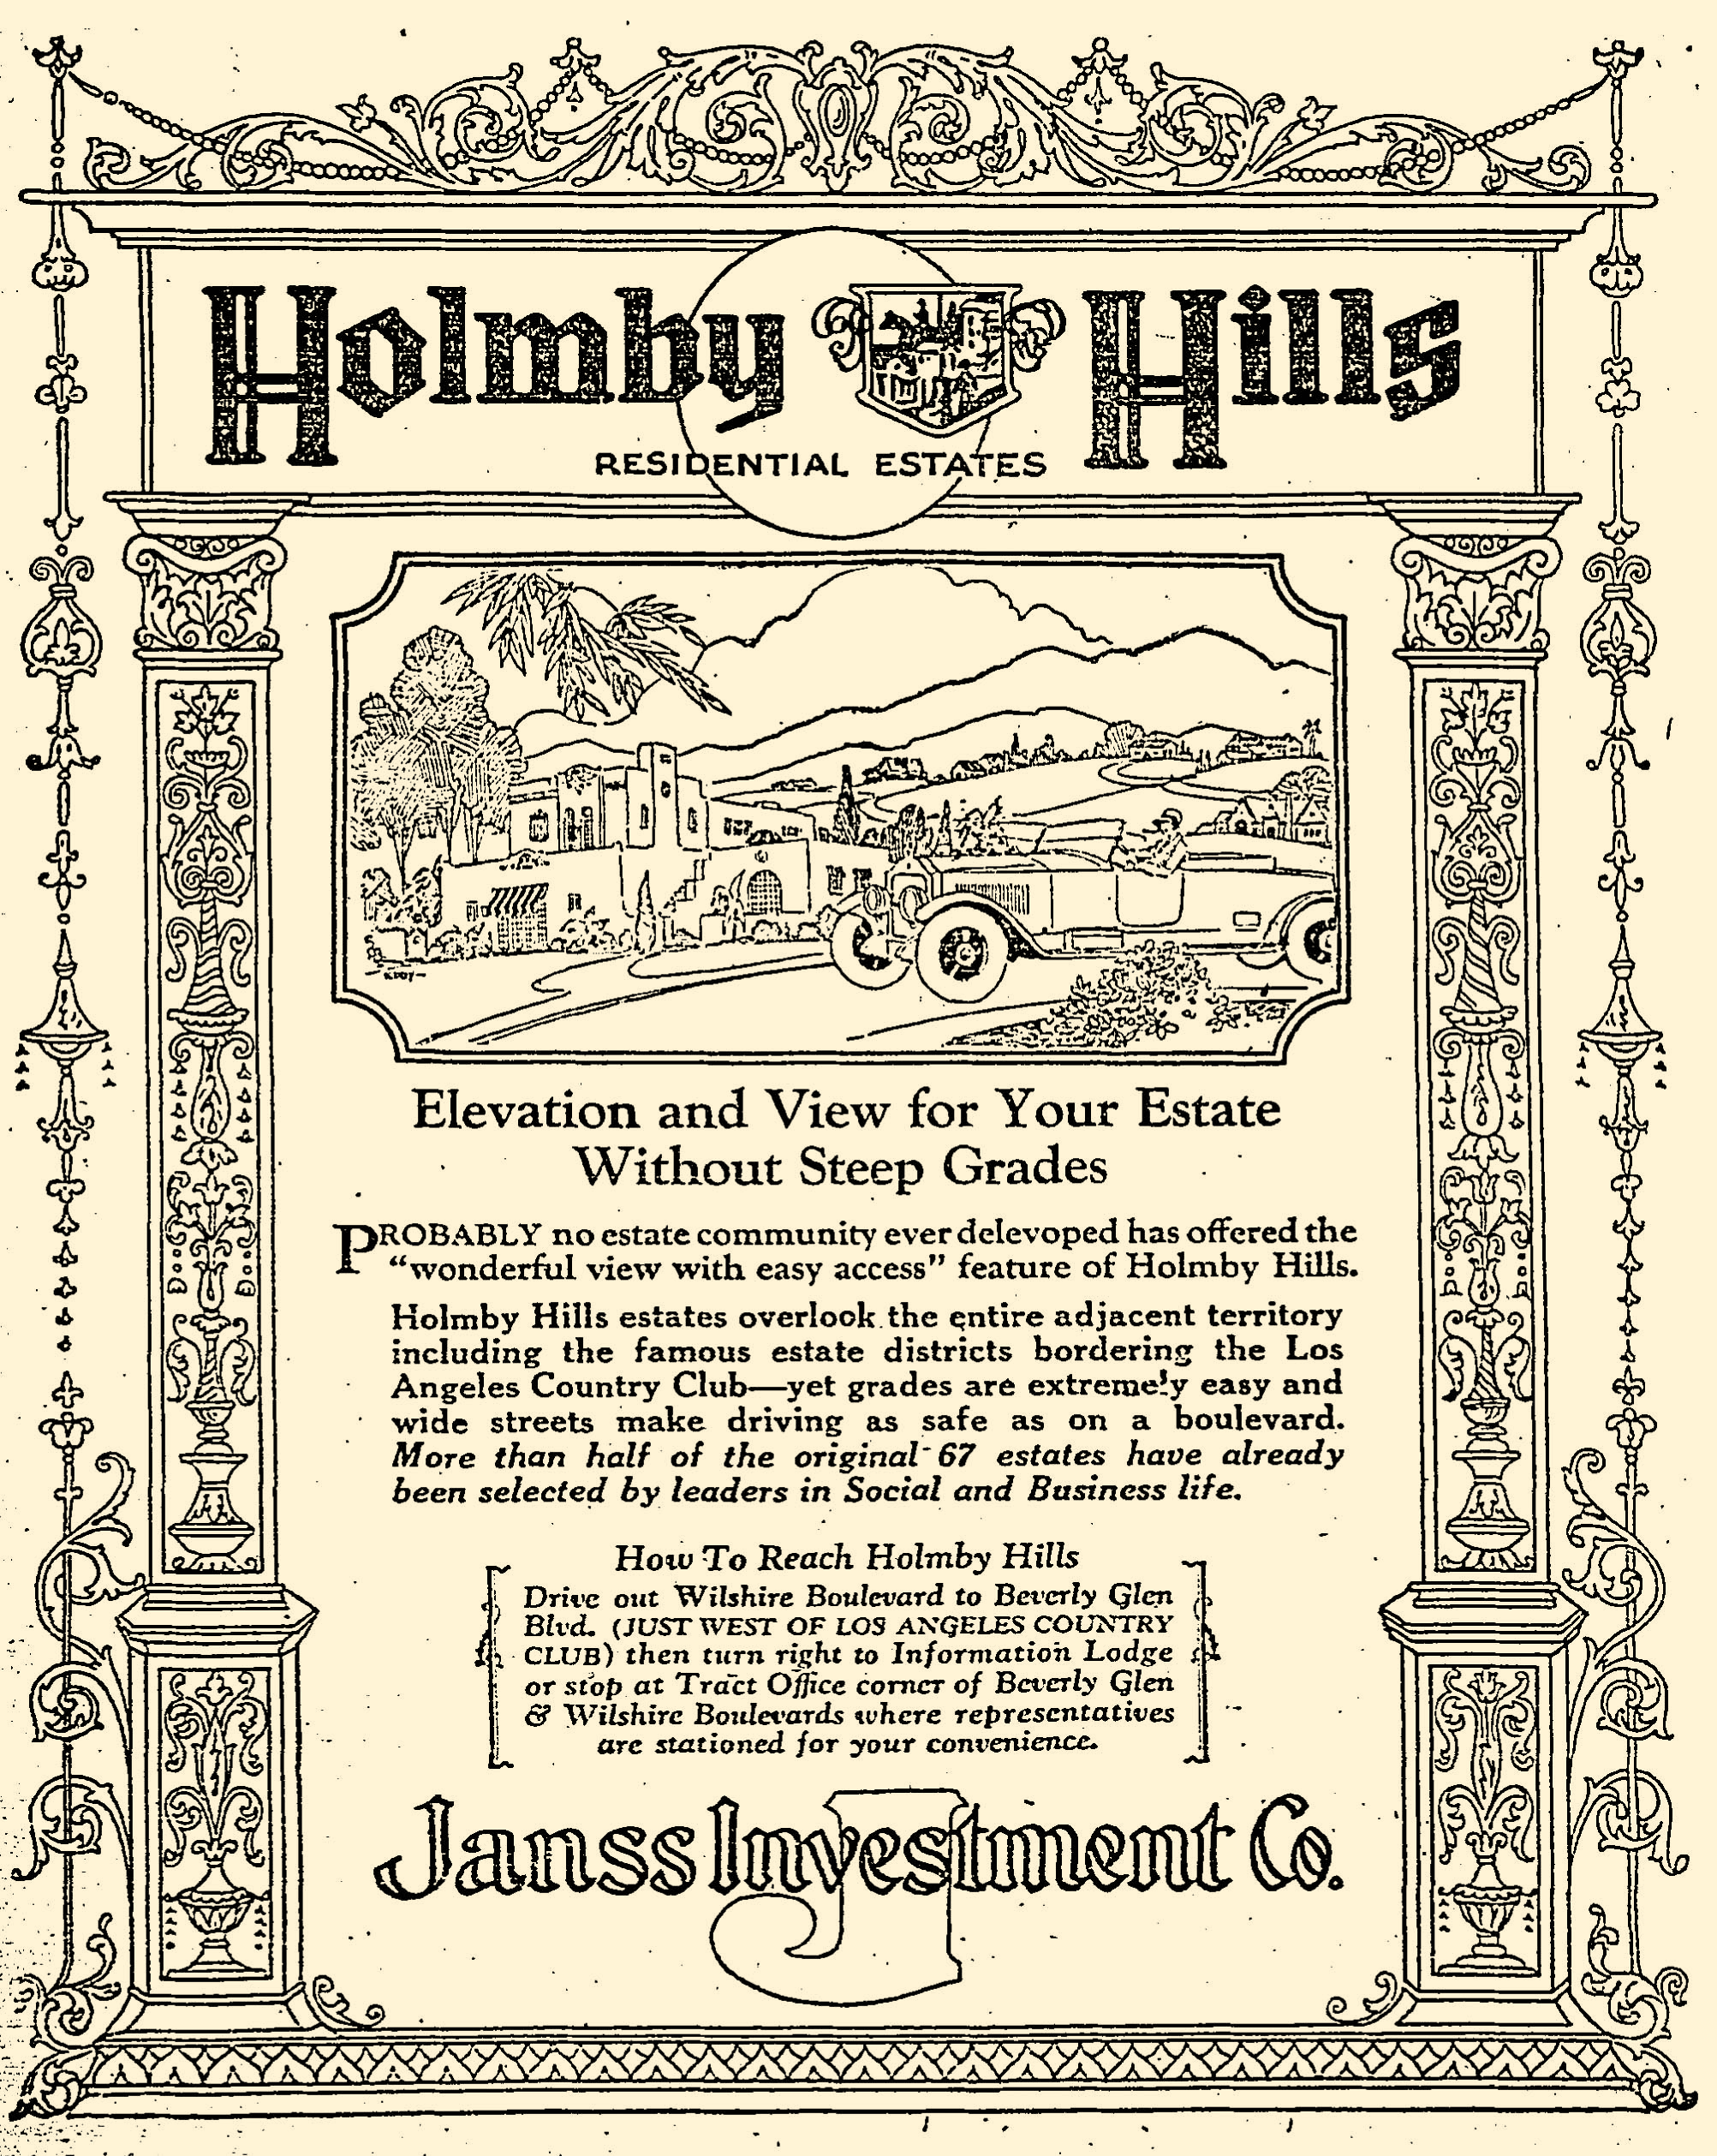 holmbyhills_05171925.jpg